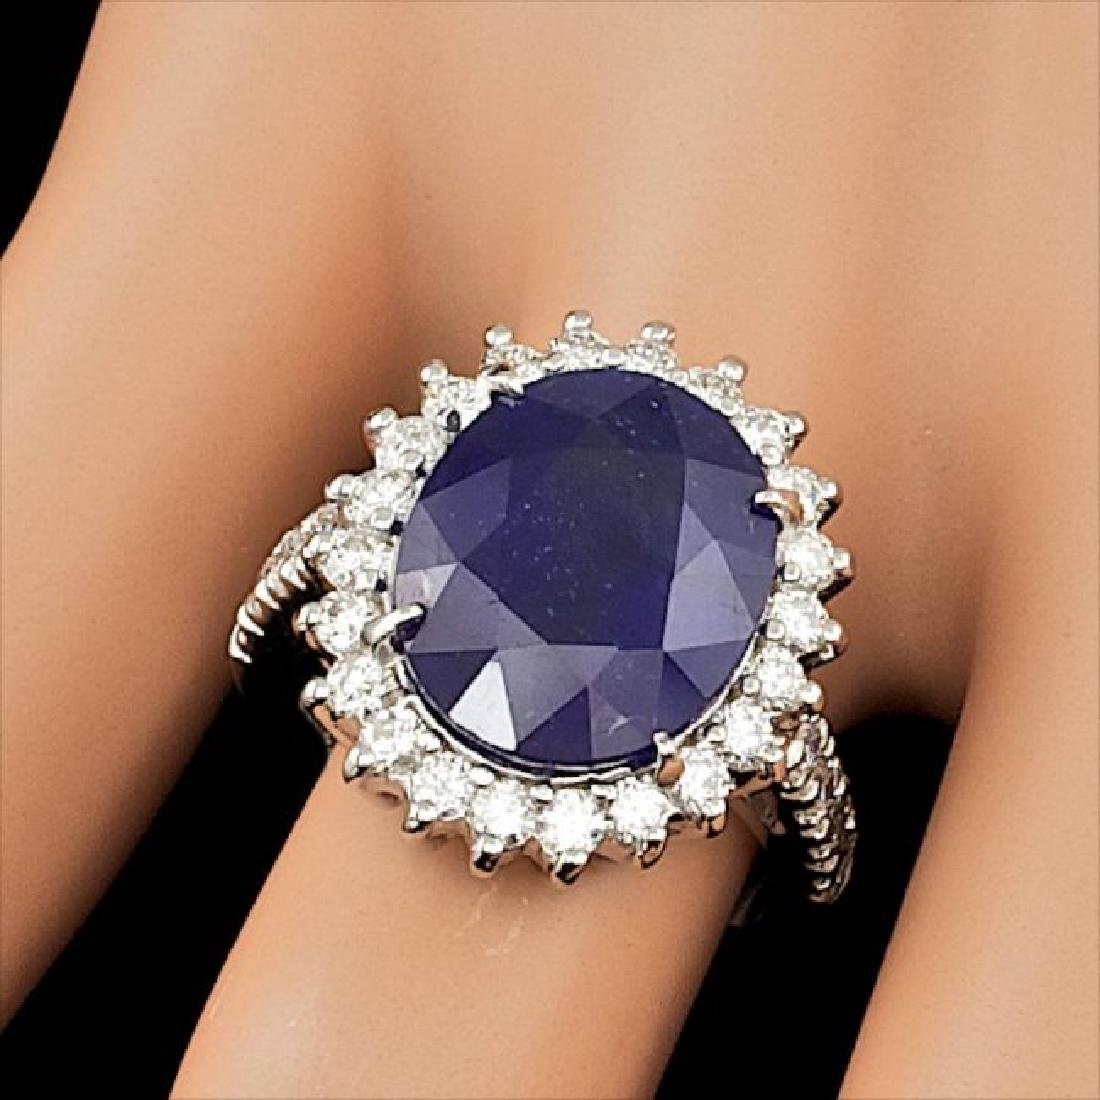 14k Gold 9.00ct Sapphire 1.15ct Diamond Ring - 4